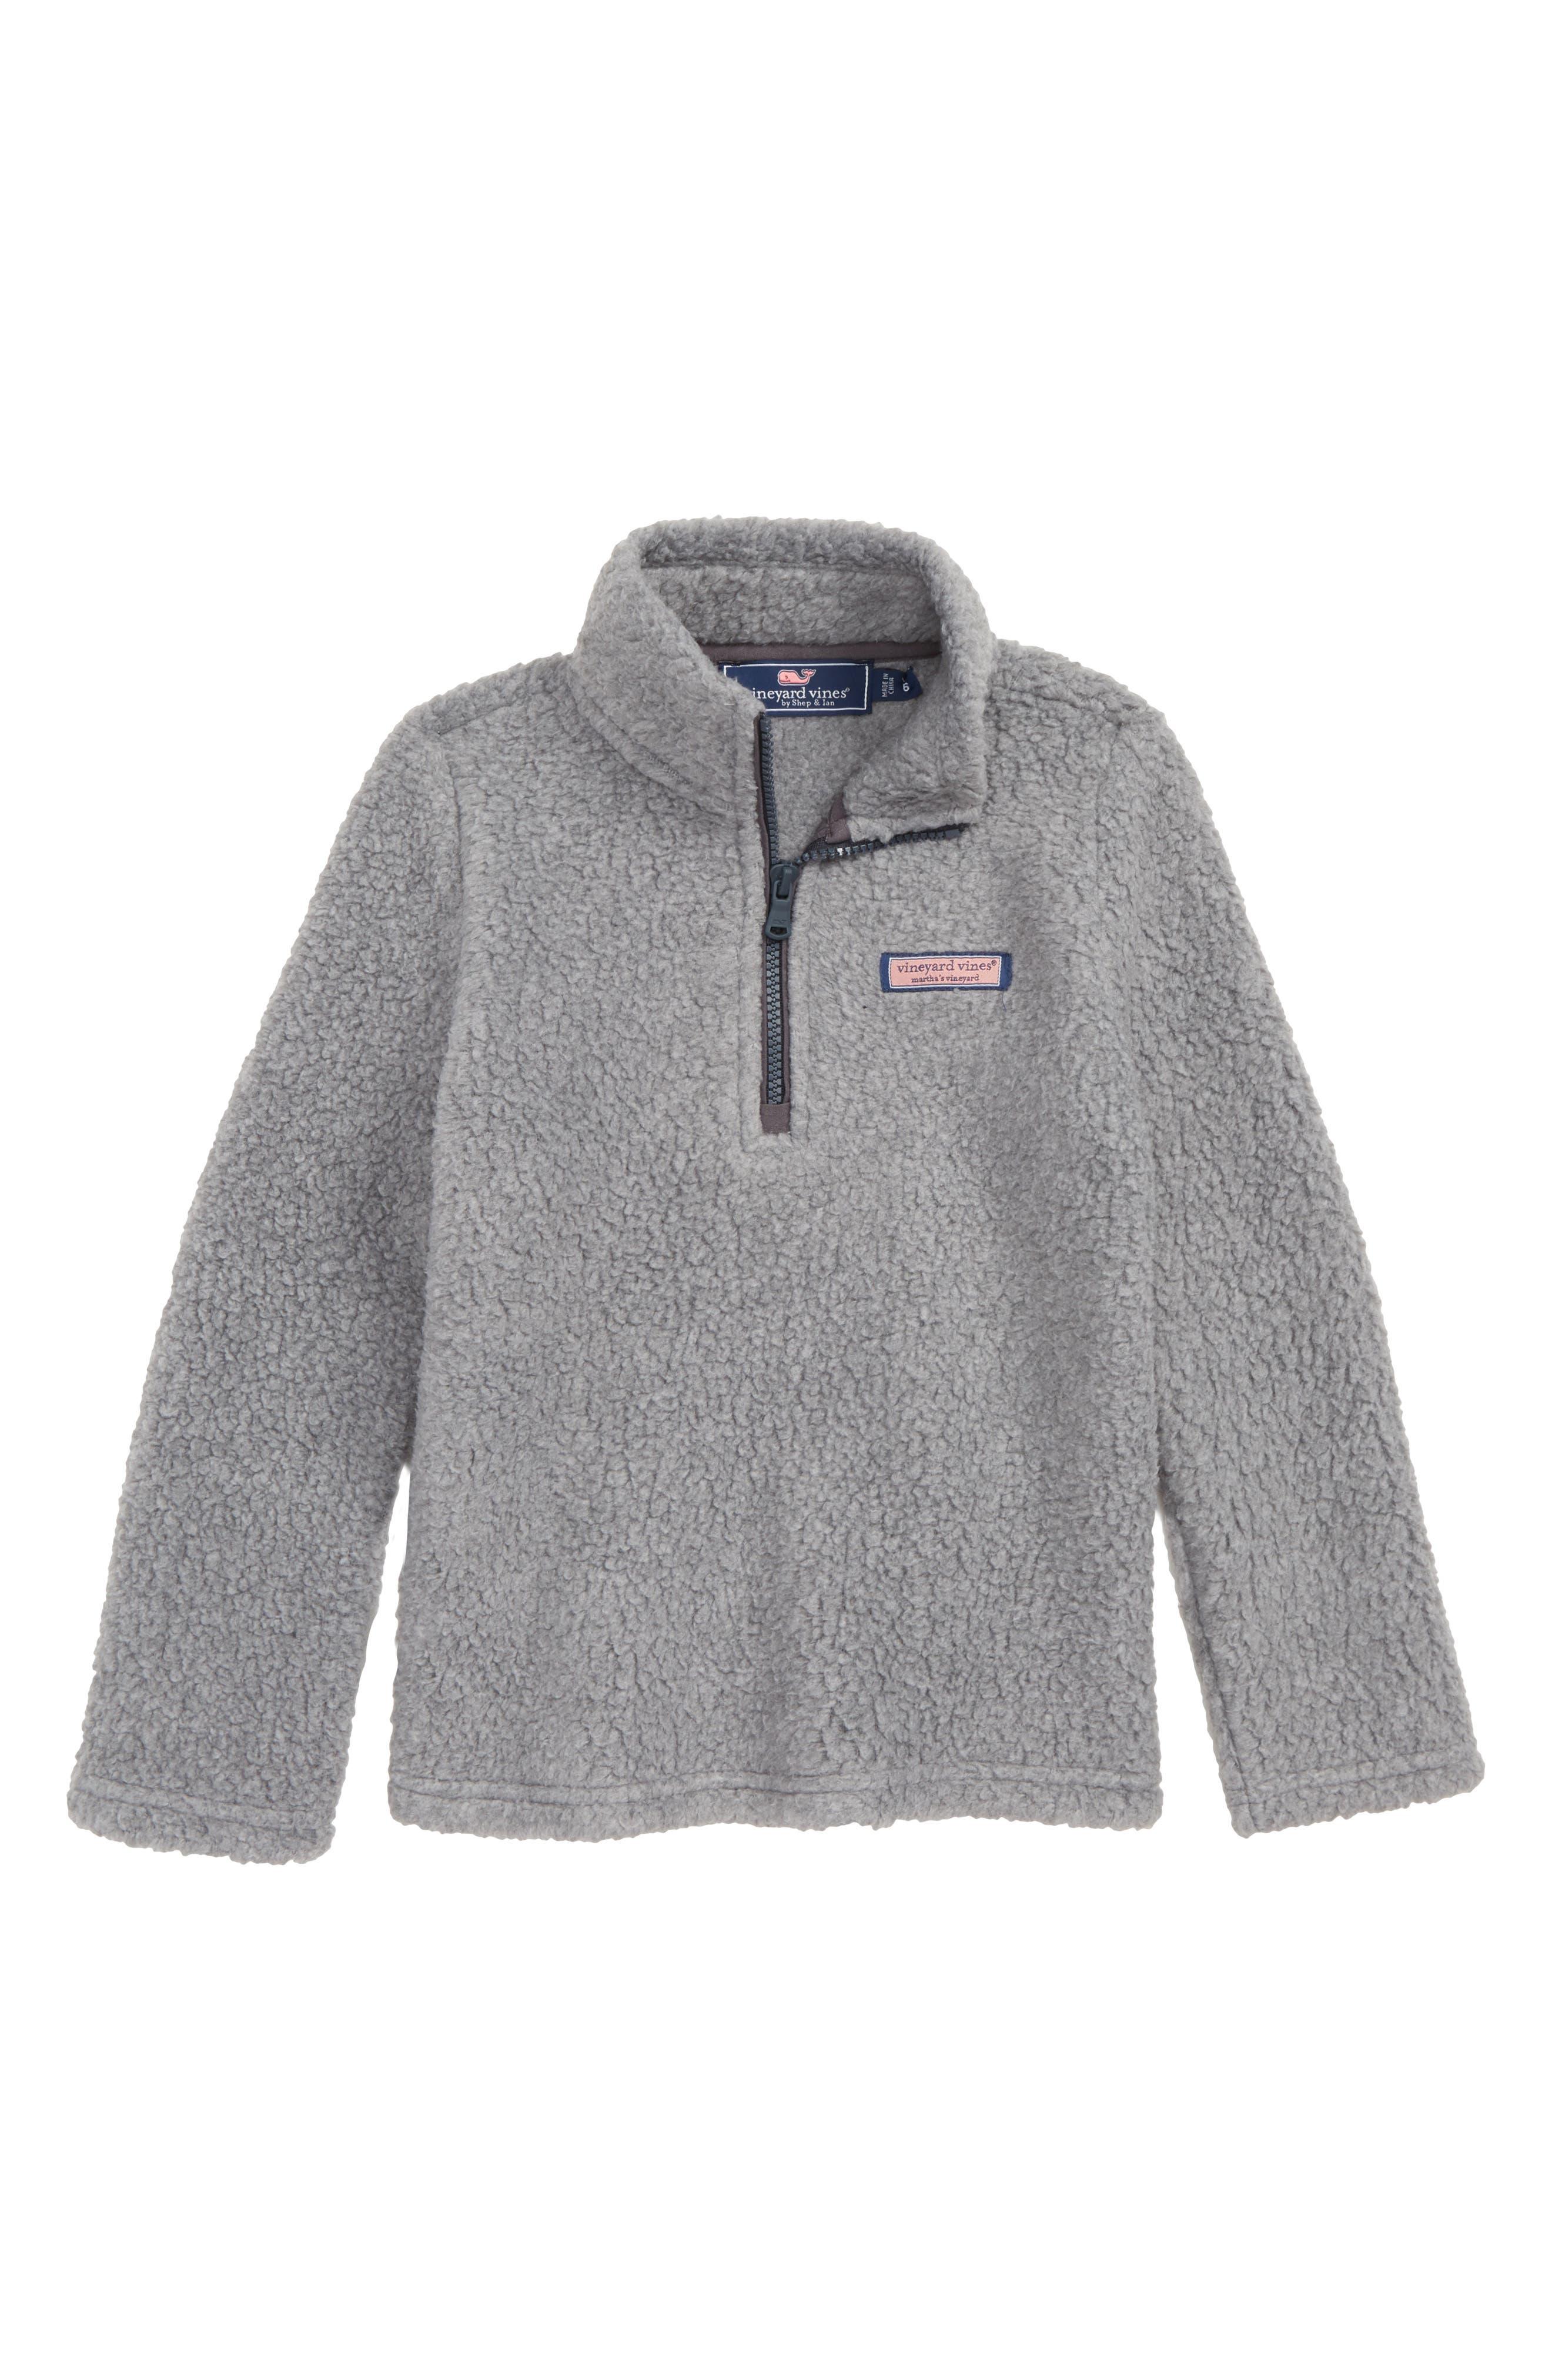 Harbor Fleece Half Zip Pullover,                             Main thumbnail 1, color,                             GRAY HEATHER